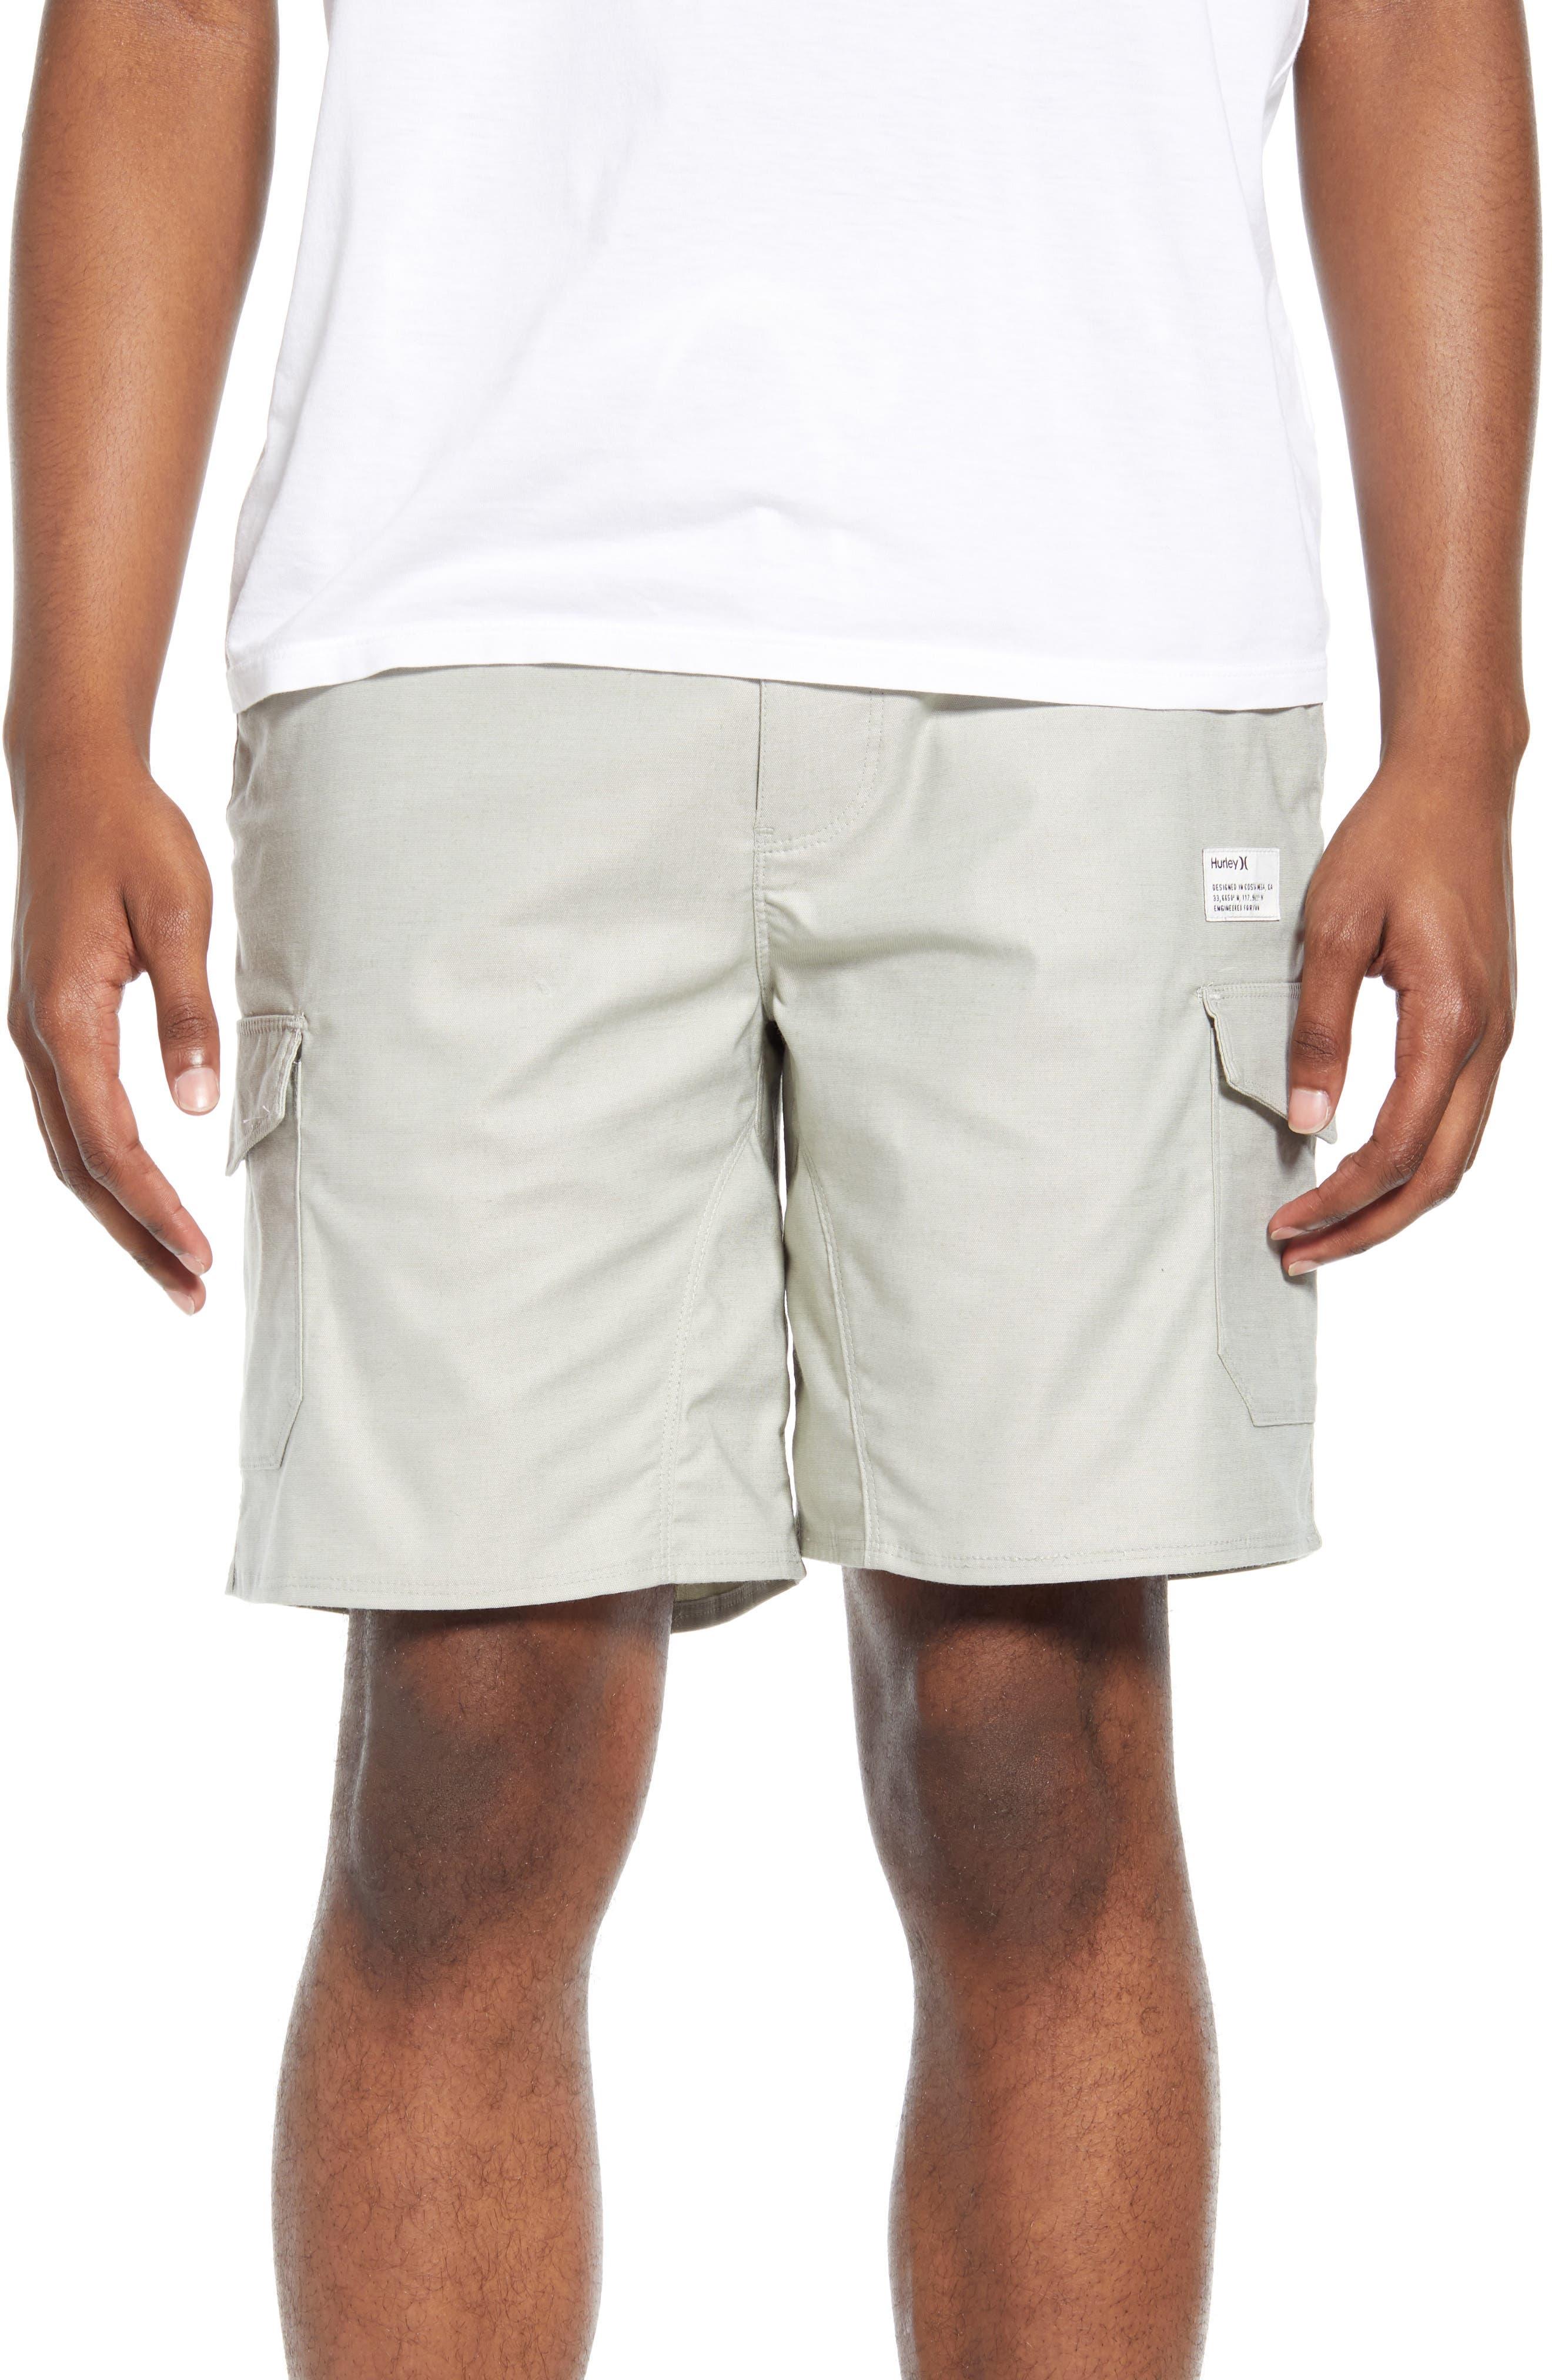 Hurley Dri-Fit Breathe Cargo Shorts